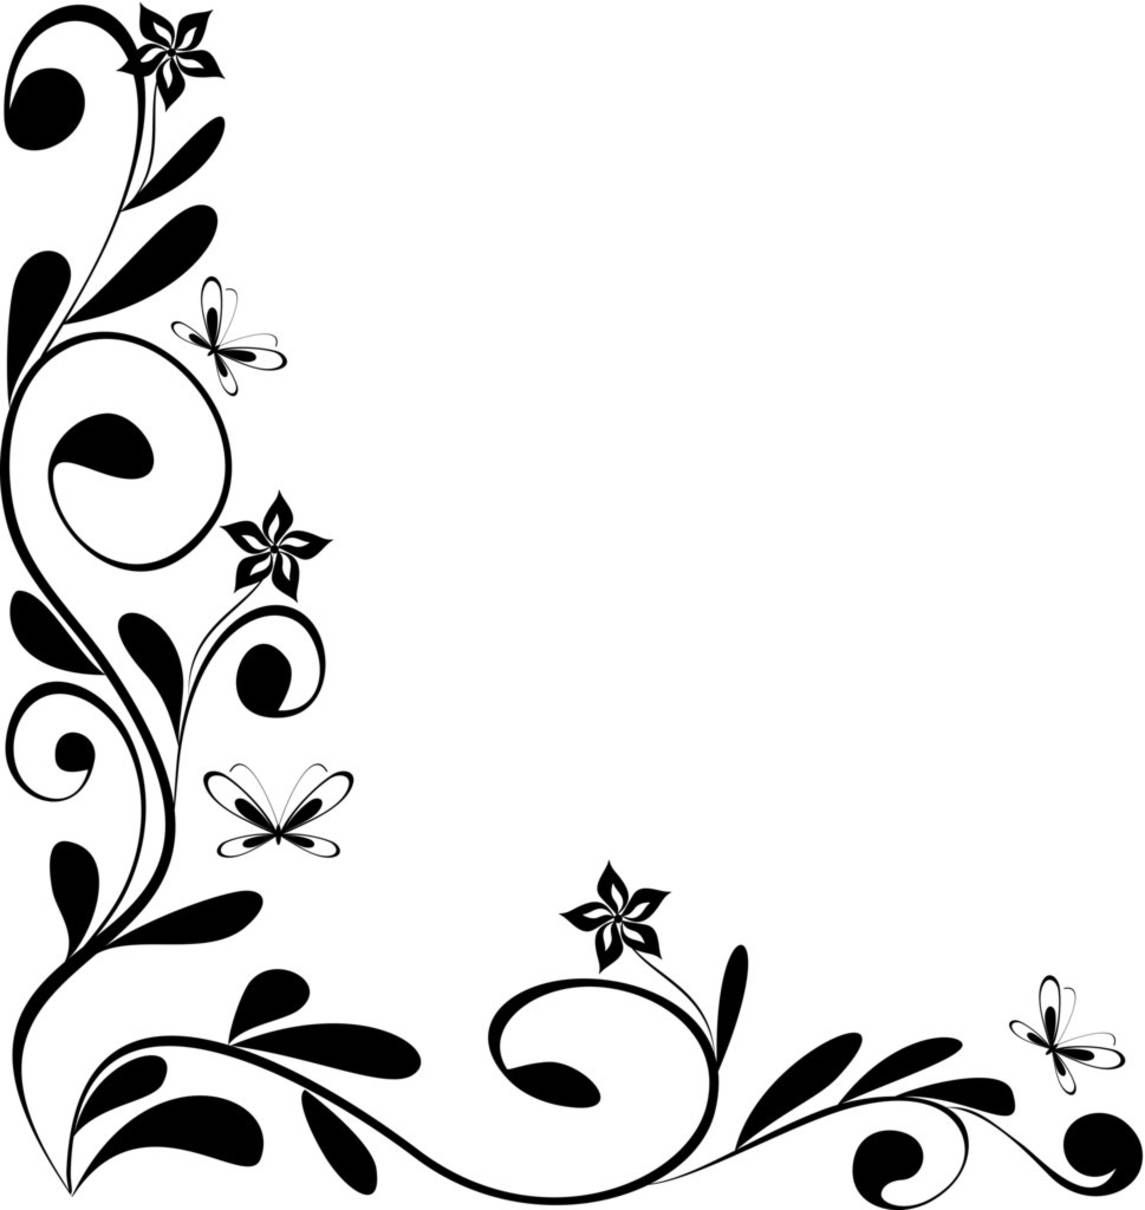 Black and White Floral Corner.